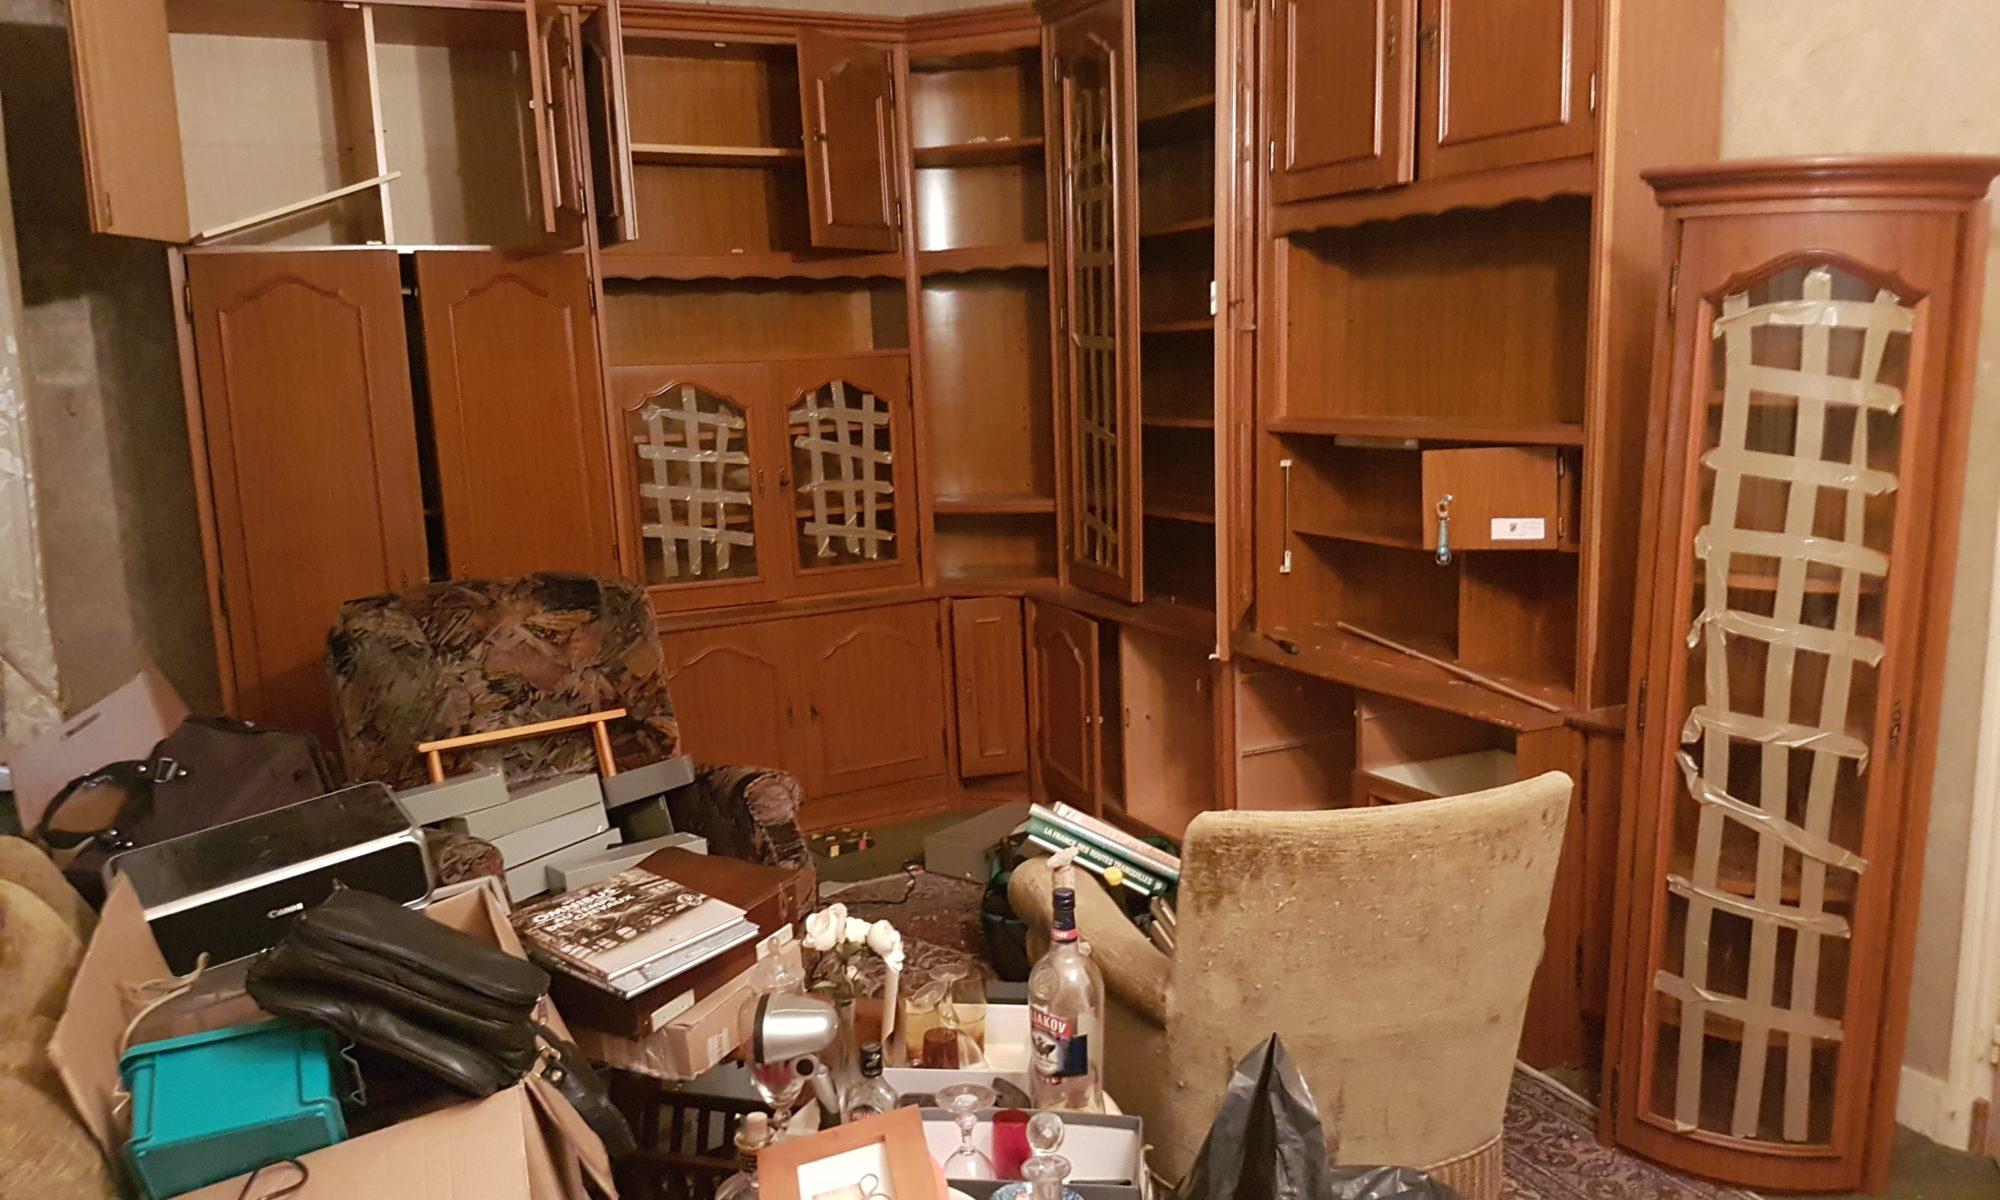 dbarrasser appartement cheap appartement aprs dbarras with dbarrasser appartement excellent se. Black Bedroom Furniture Sets. Home Design Ideas